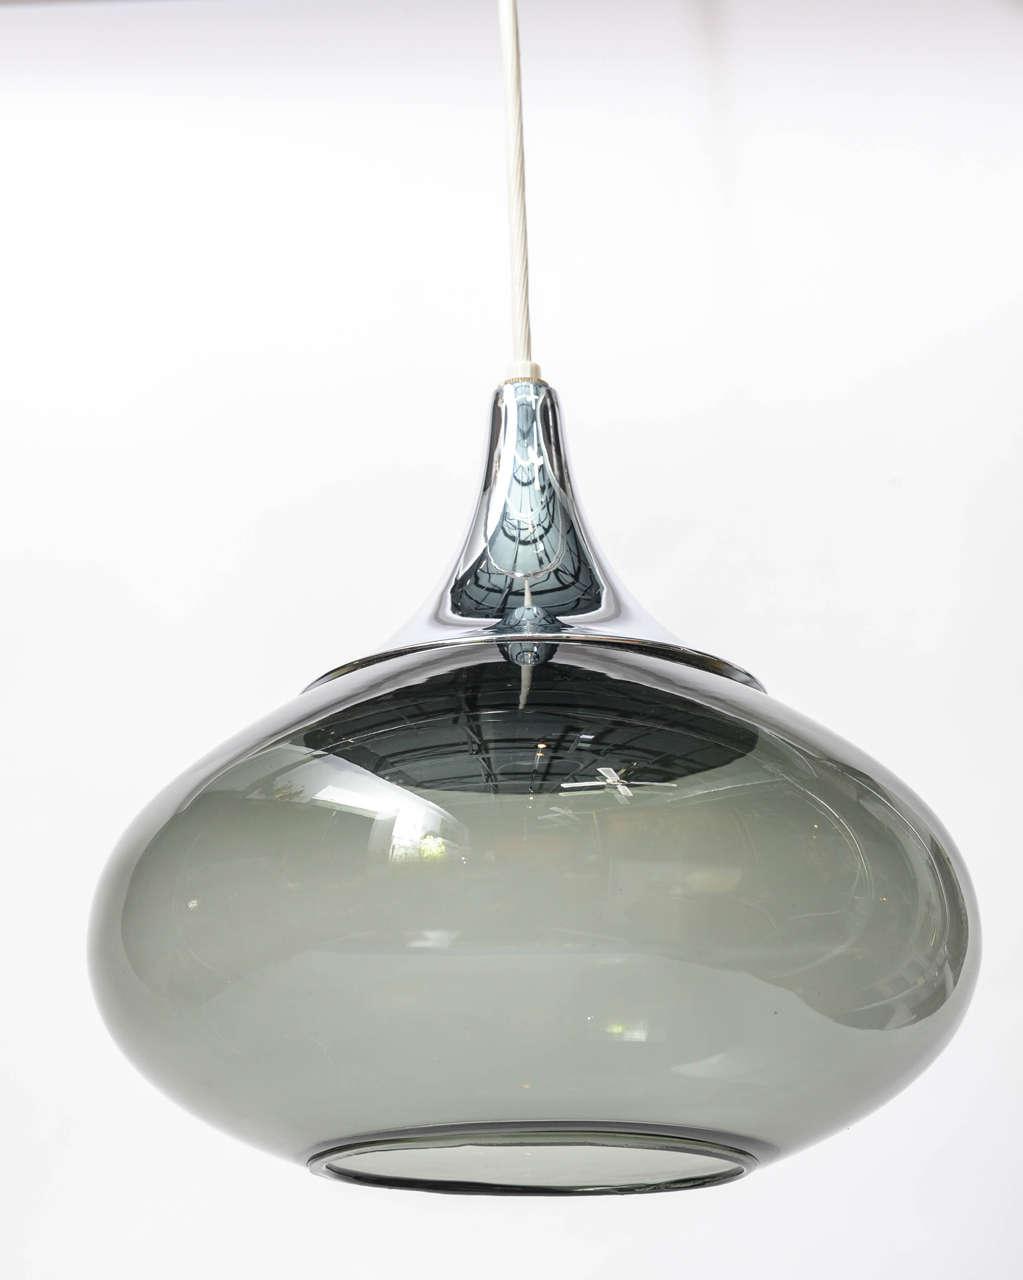 1960s Chrome And Smoked Glass Teardrop Pendant Lamp At 1stdibs